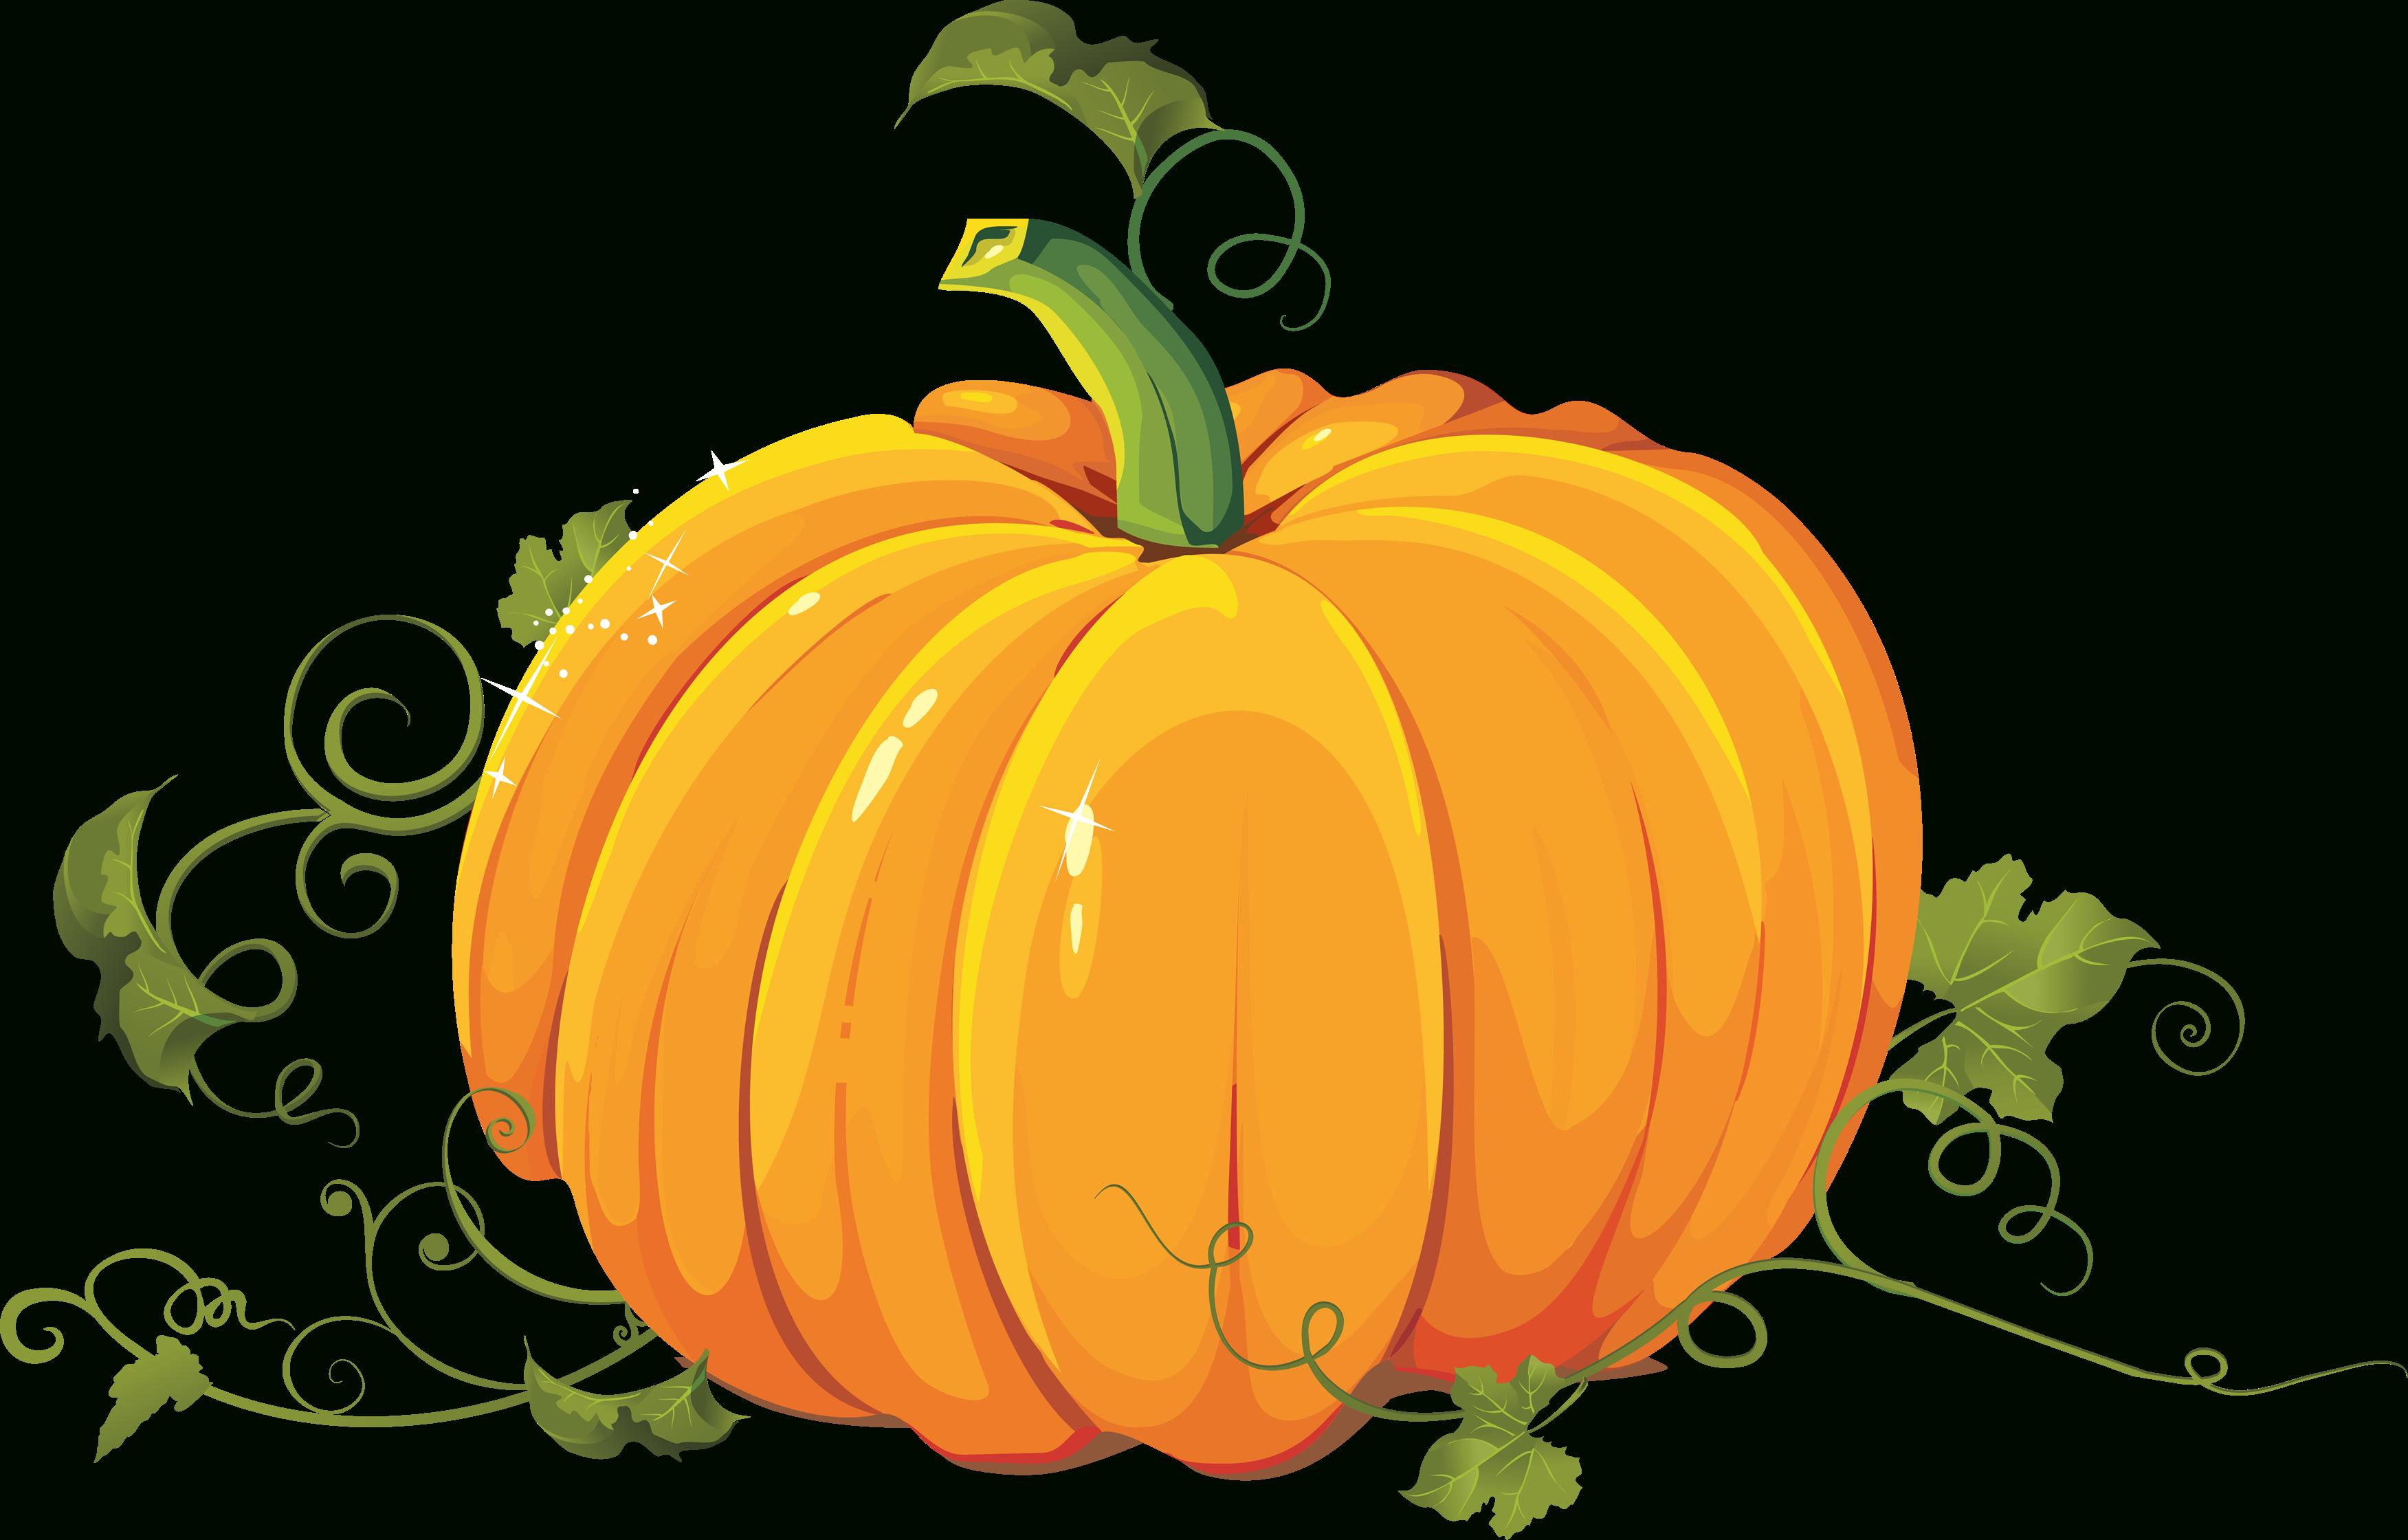 Pumpkin PNG Images Transparent Free Download.